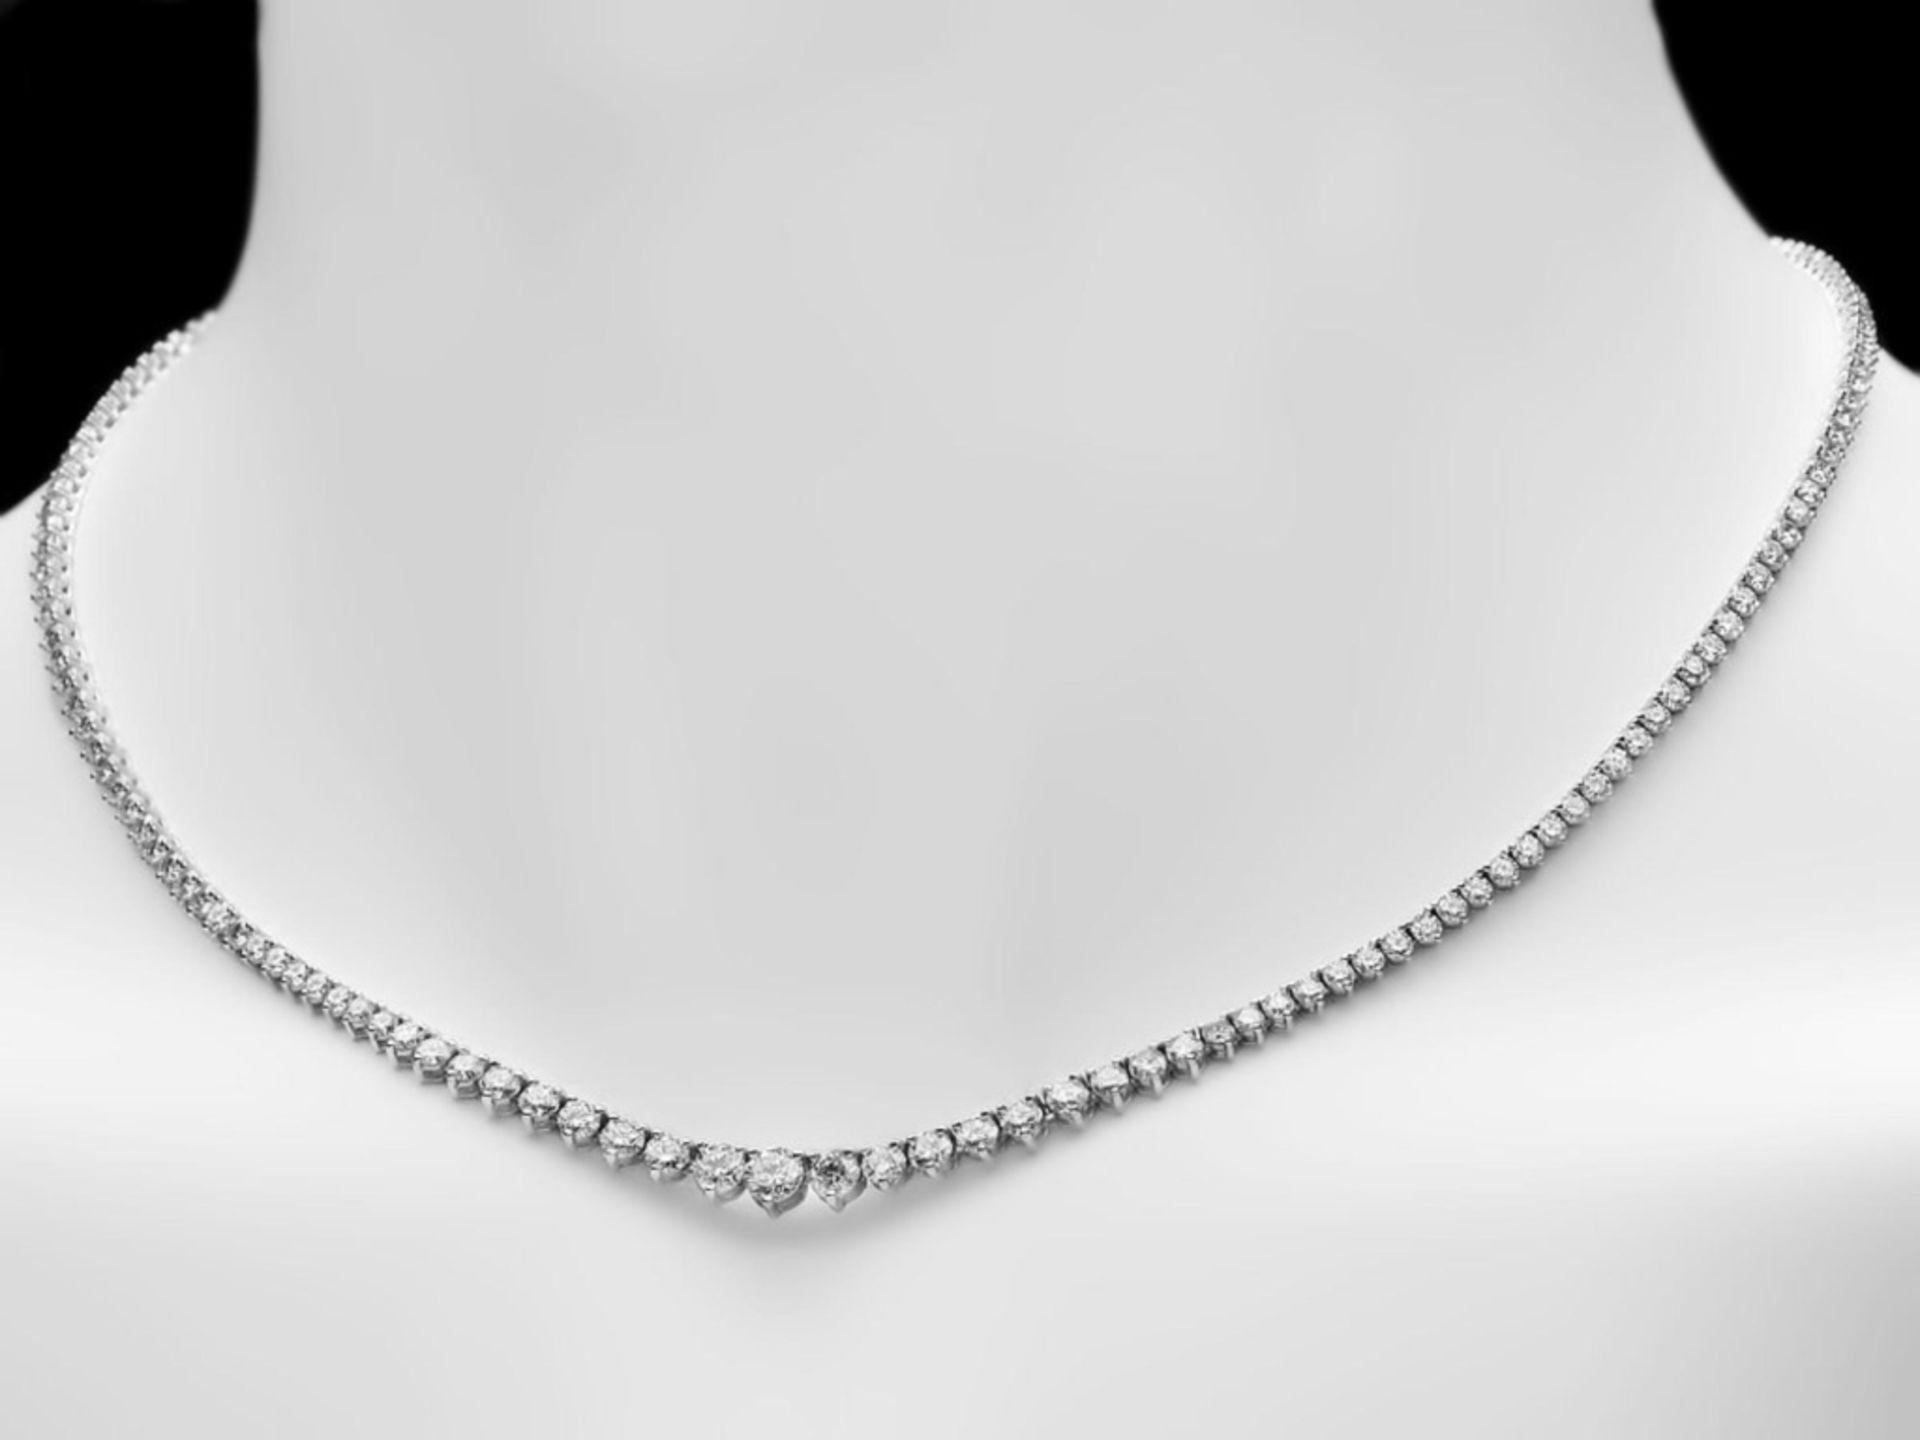 ^18k White Gold 9.00ct Diamond Necklace - Image 2 of 5